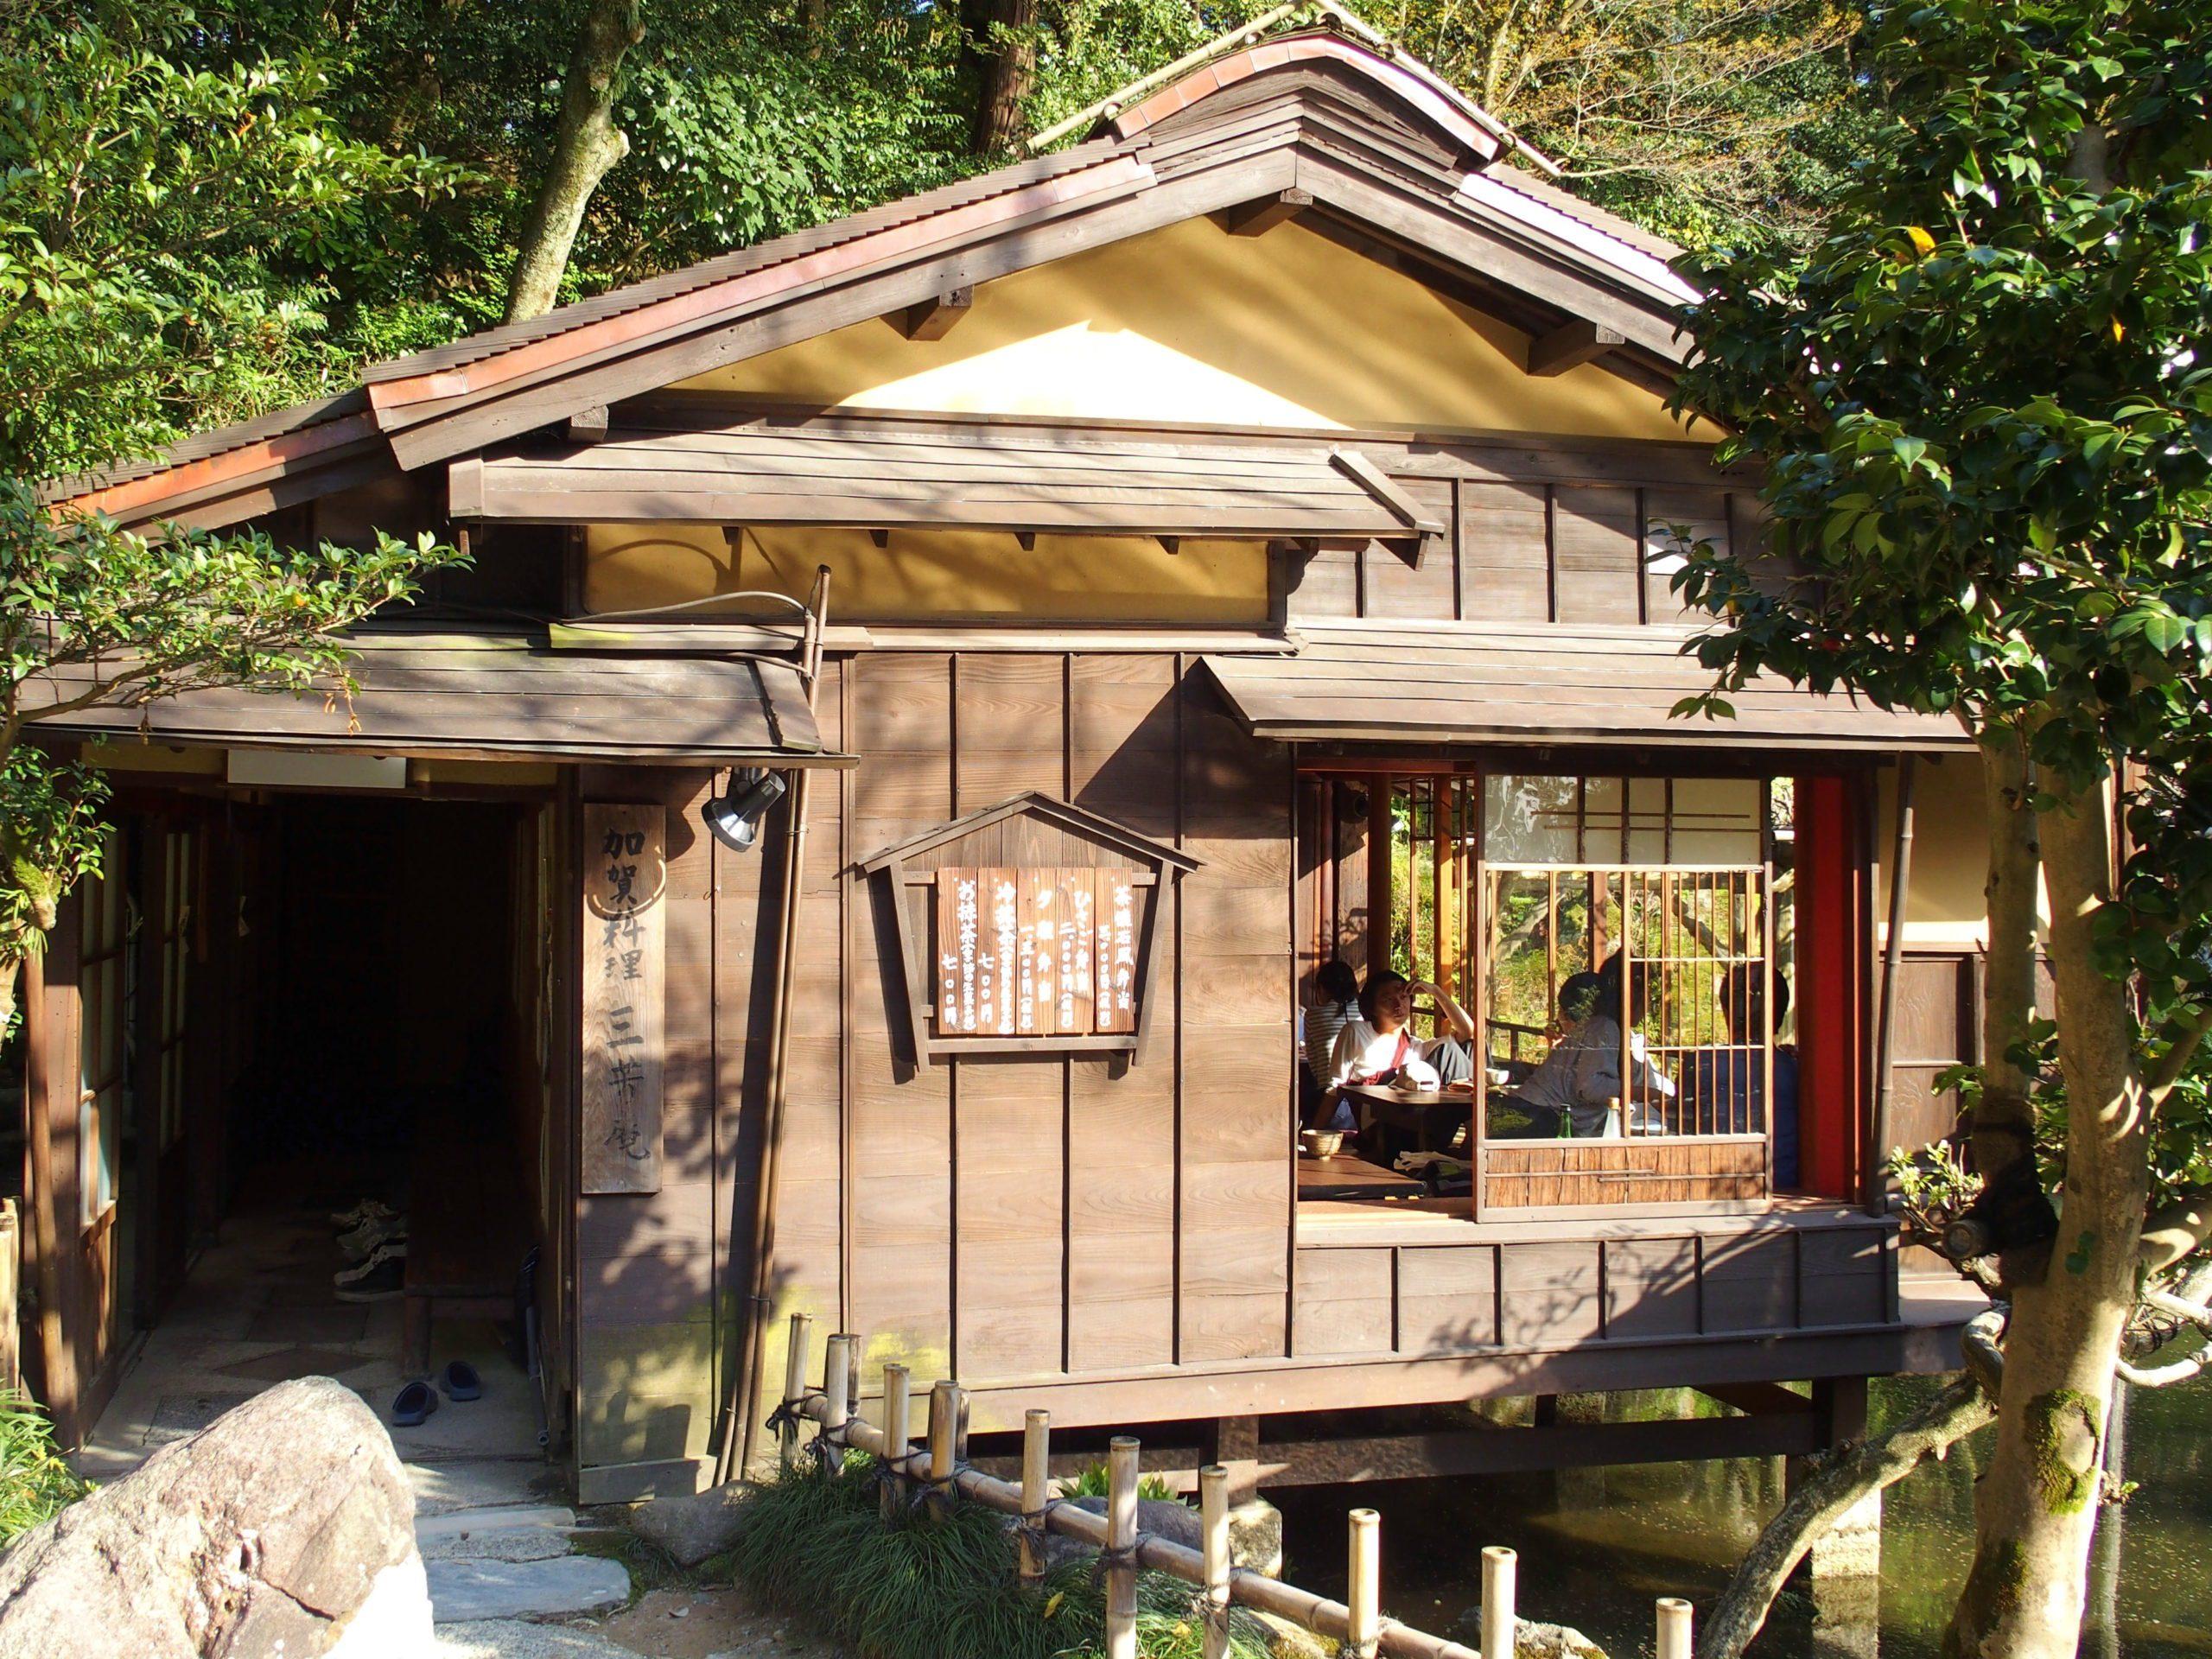 Maison de thé jardin Kenrokuen Kanazawa Japon